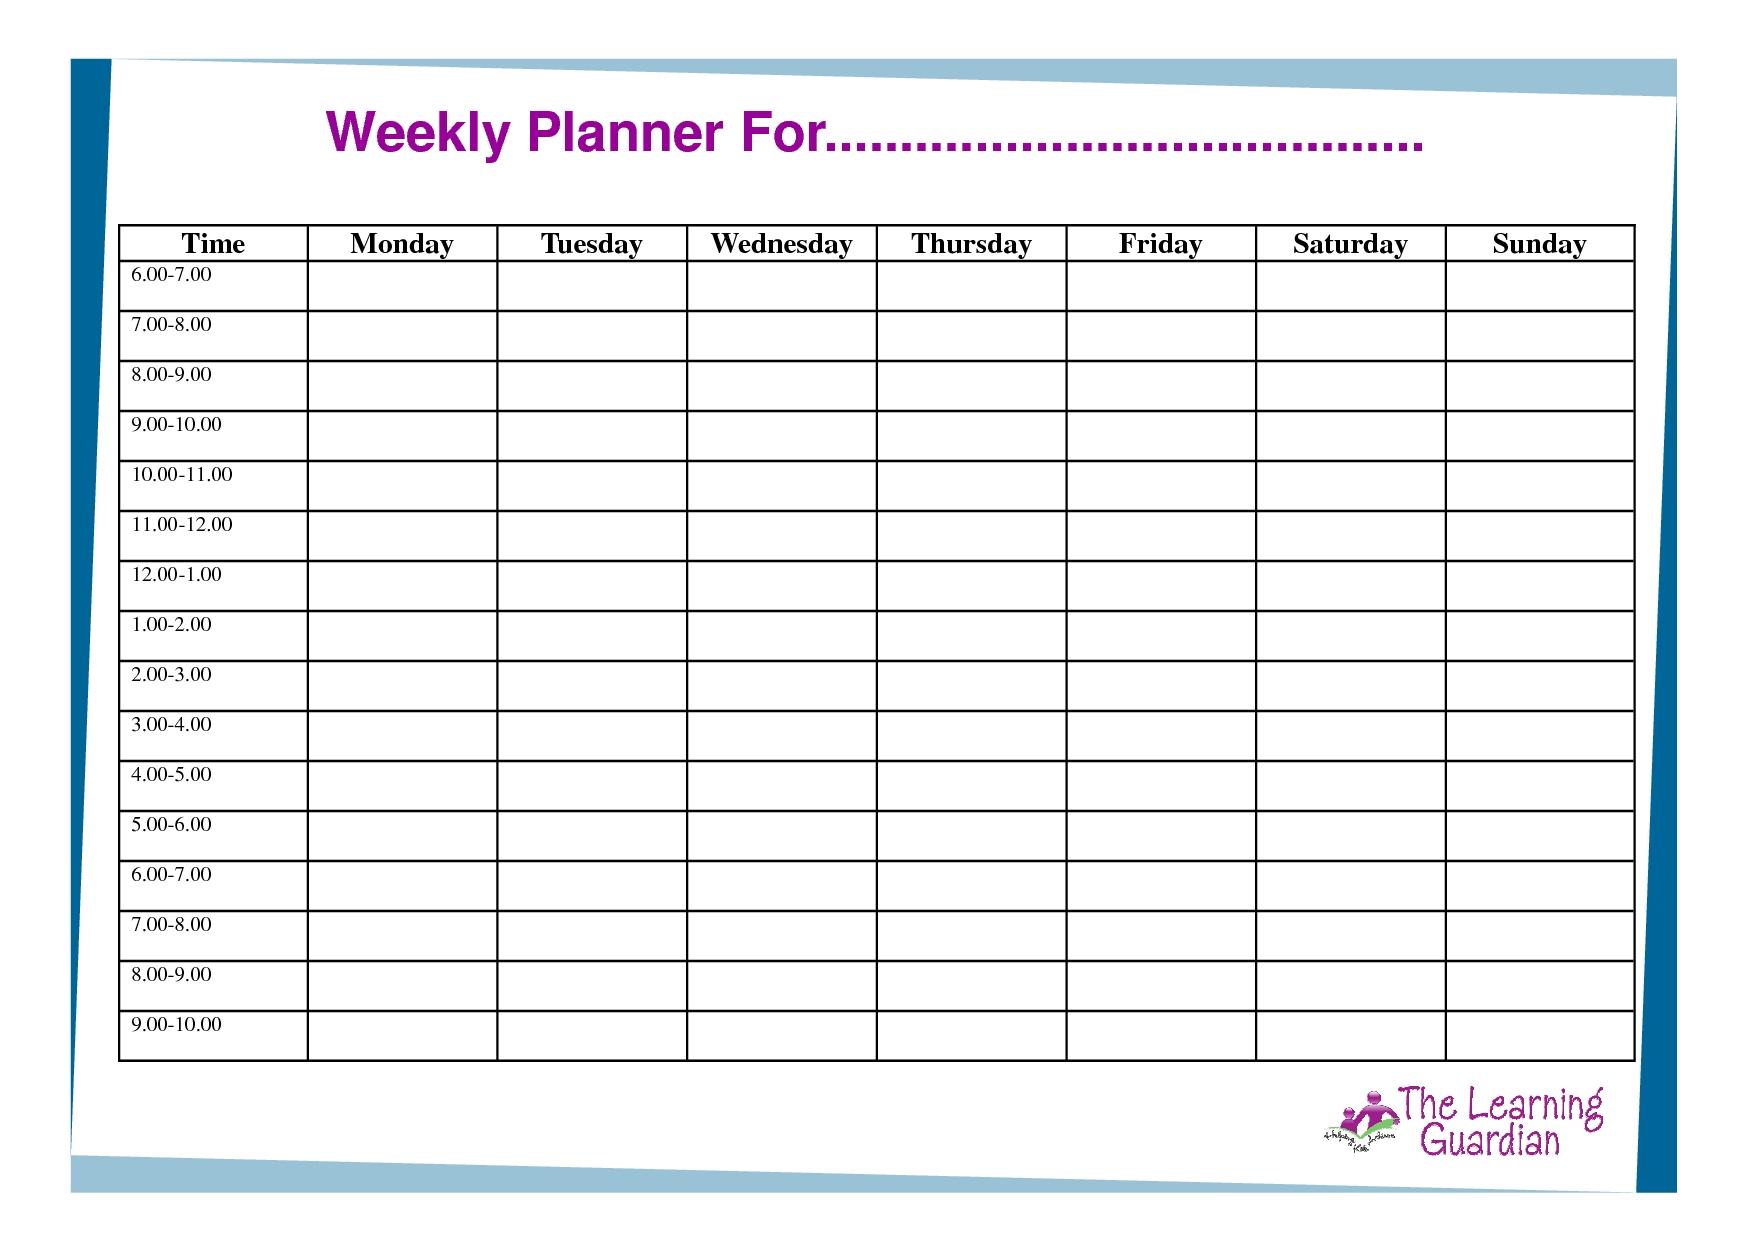 Weekly Calendar H Hours Template Erieairfair Downloadable